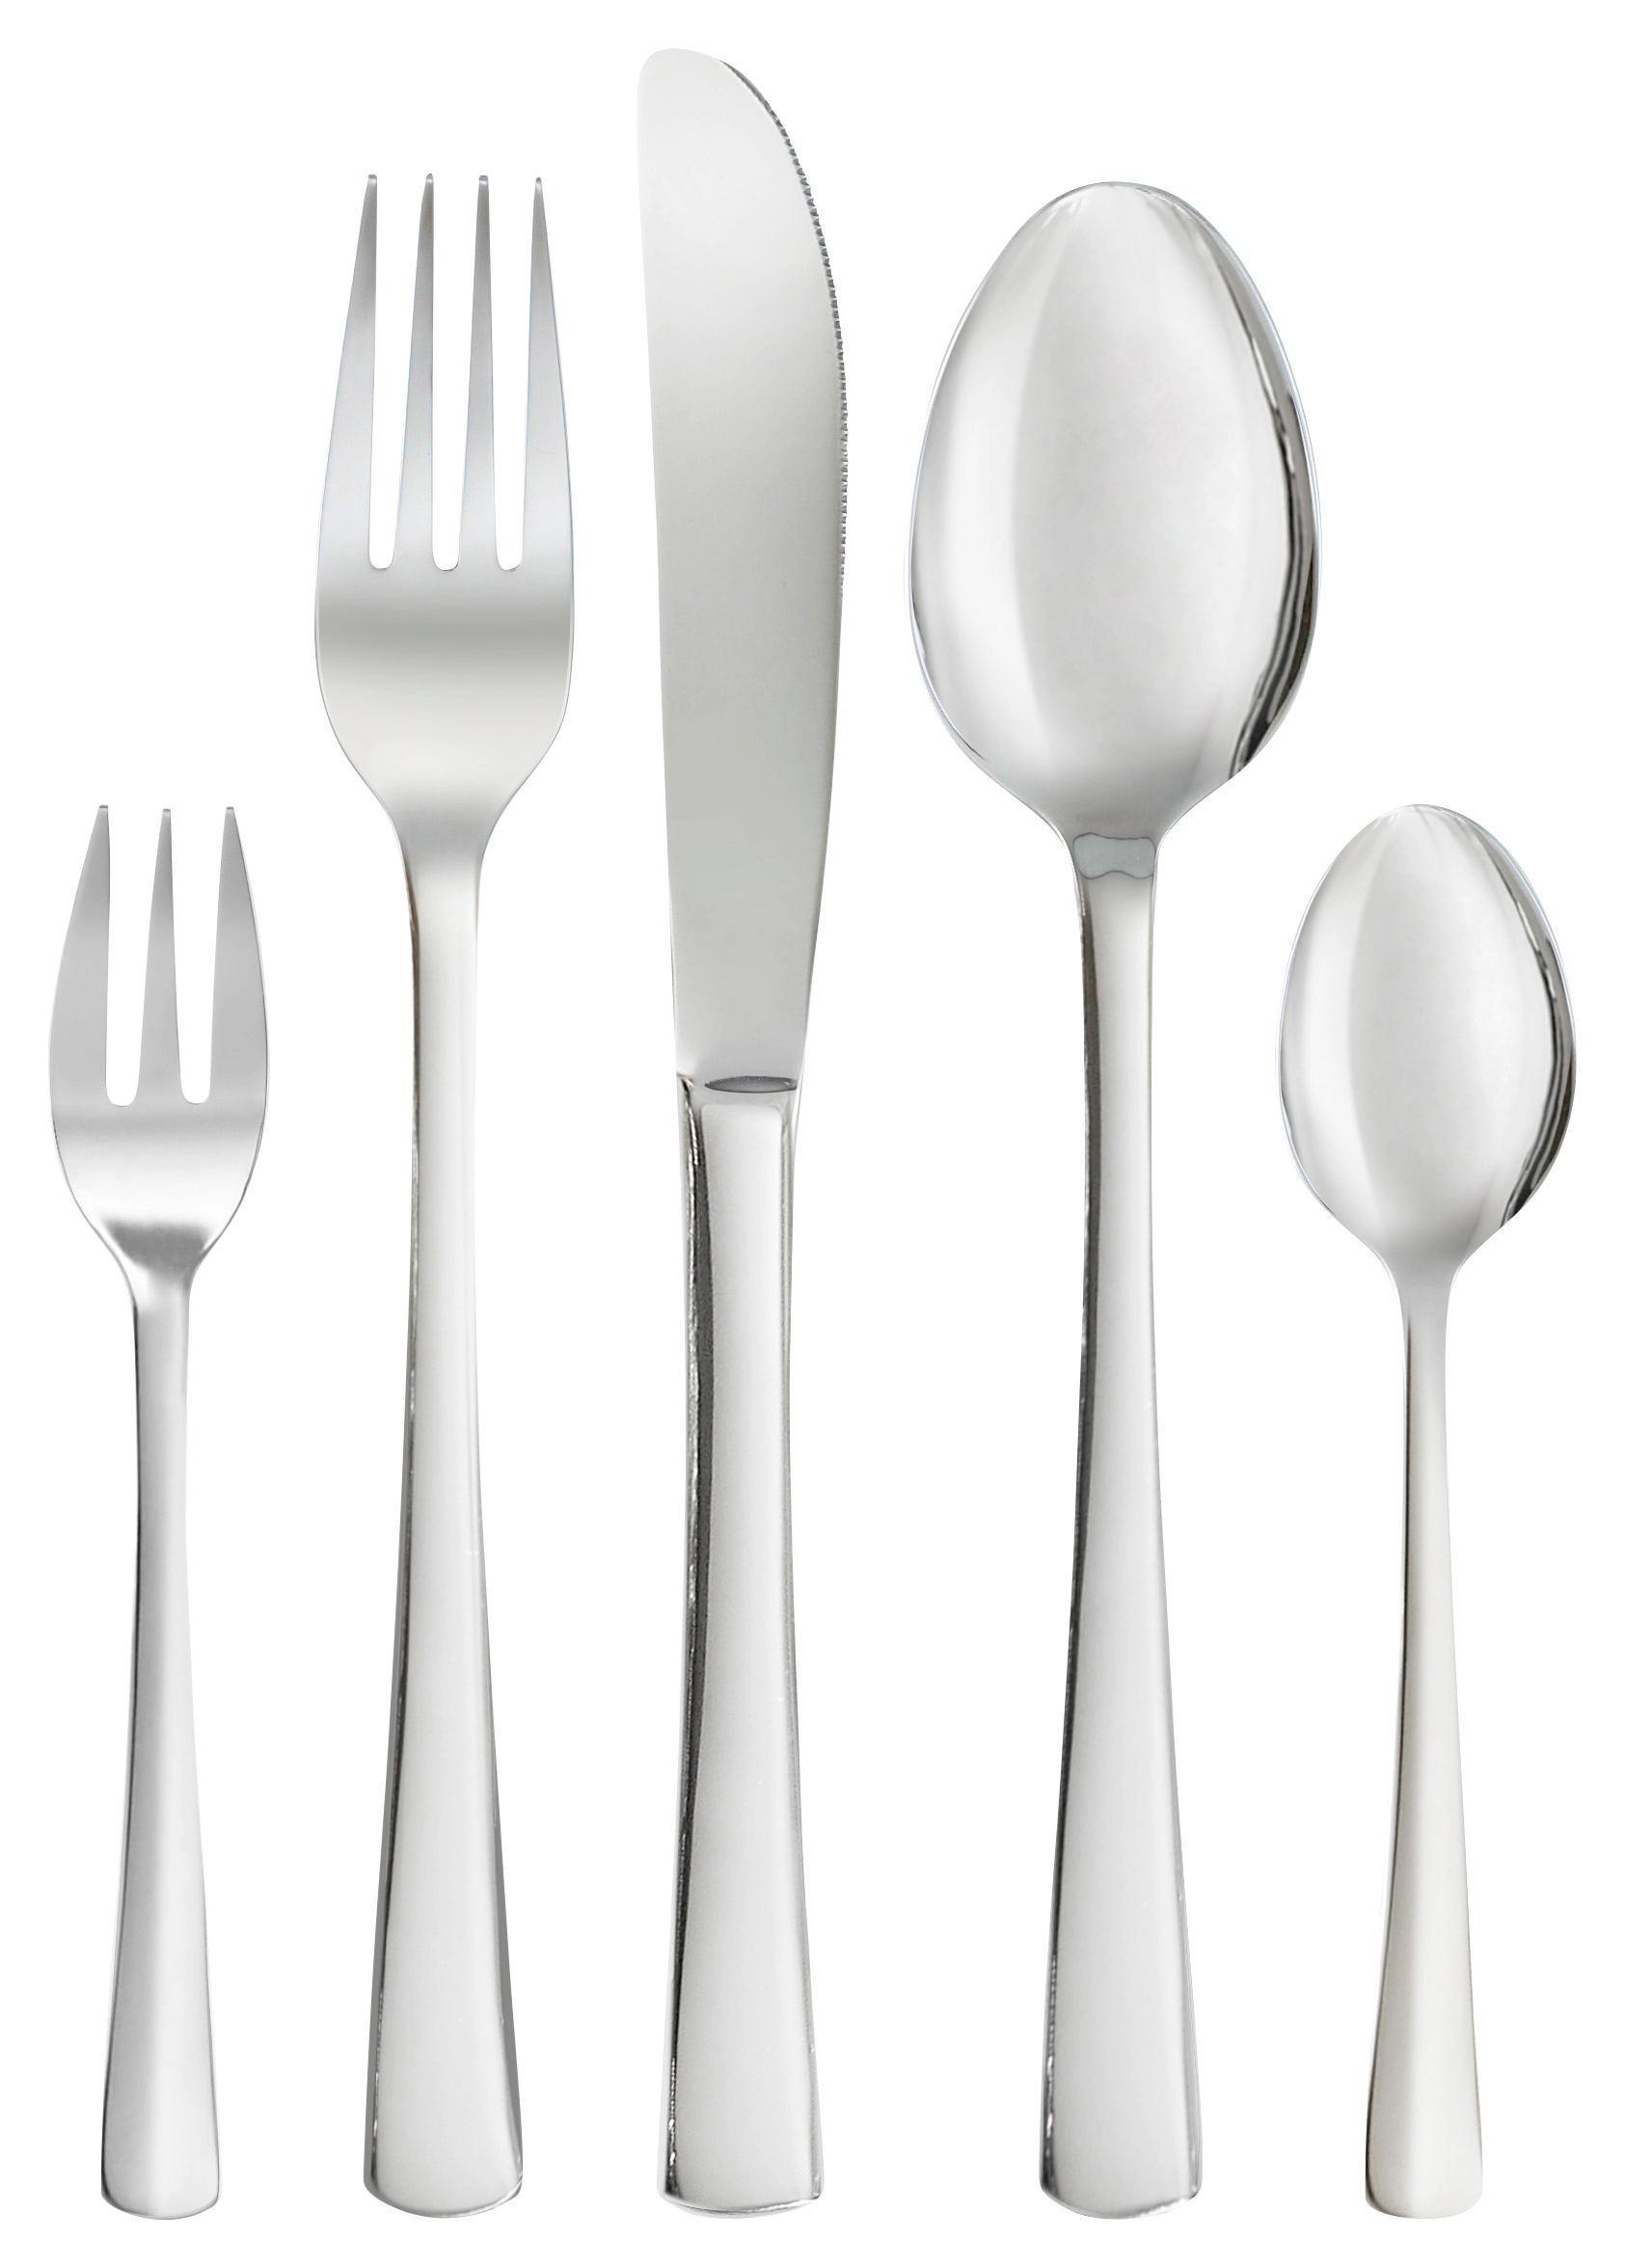 BESTECKSET - Edelstahlfarben, Basics, Metall - HOMEWARE